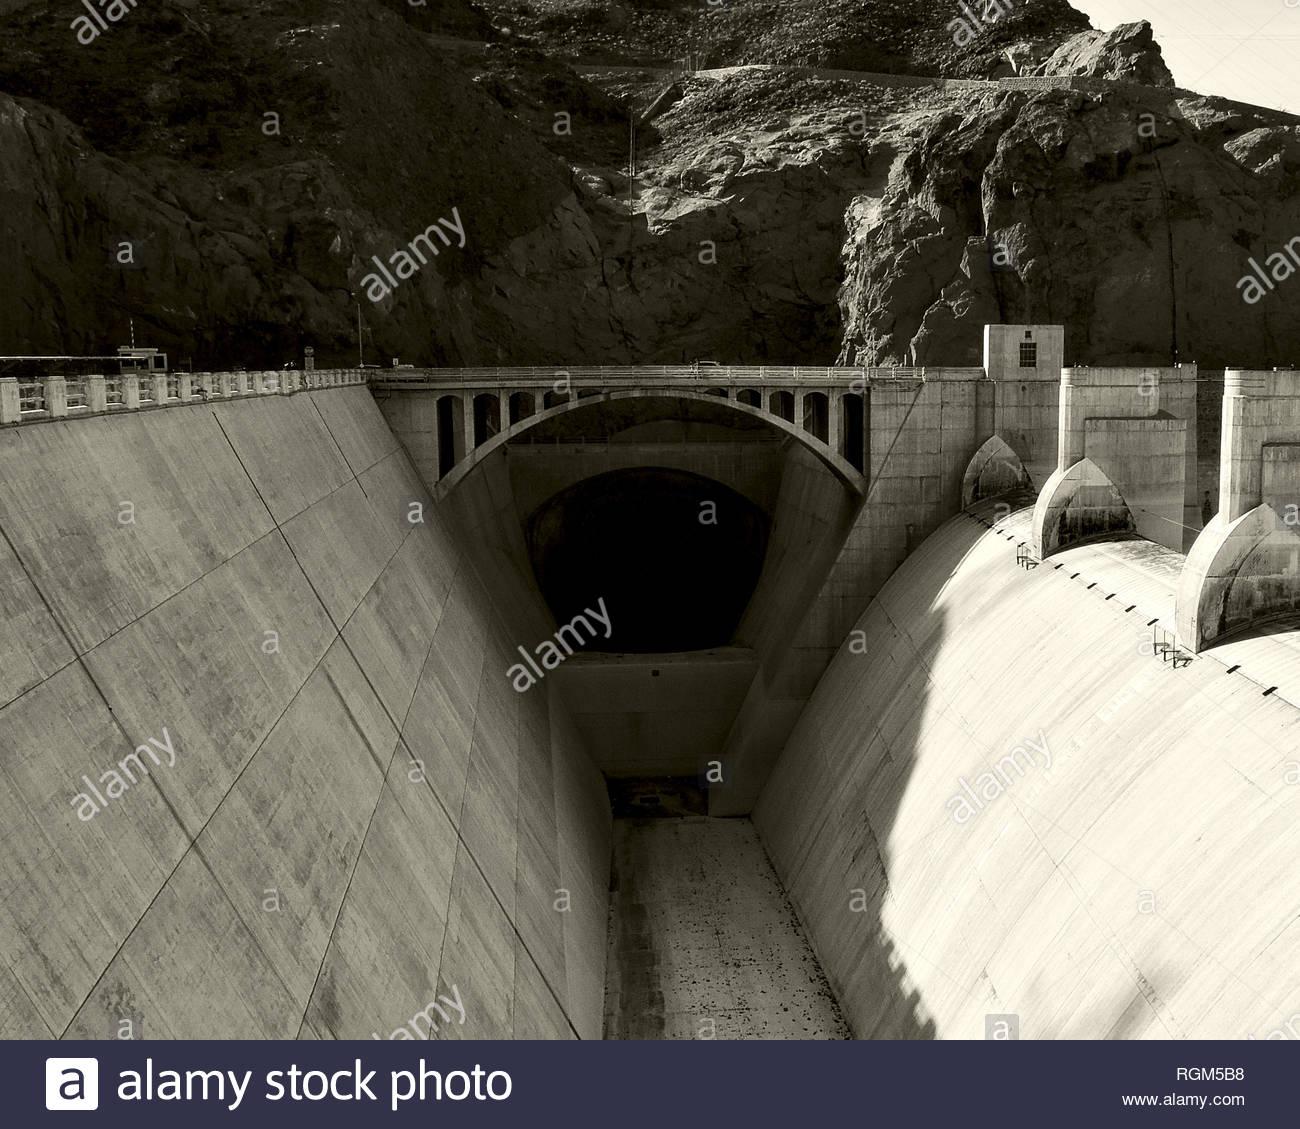 Hoover Dam Construction Not Bypass Stock Photos & Hoover Dam